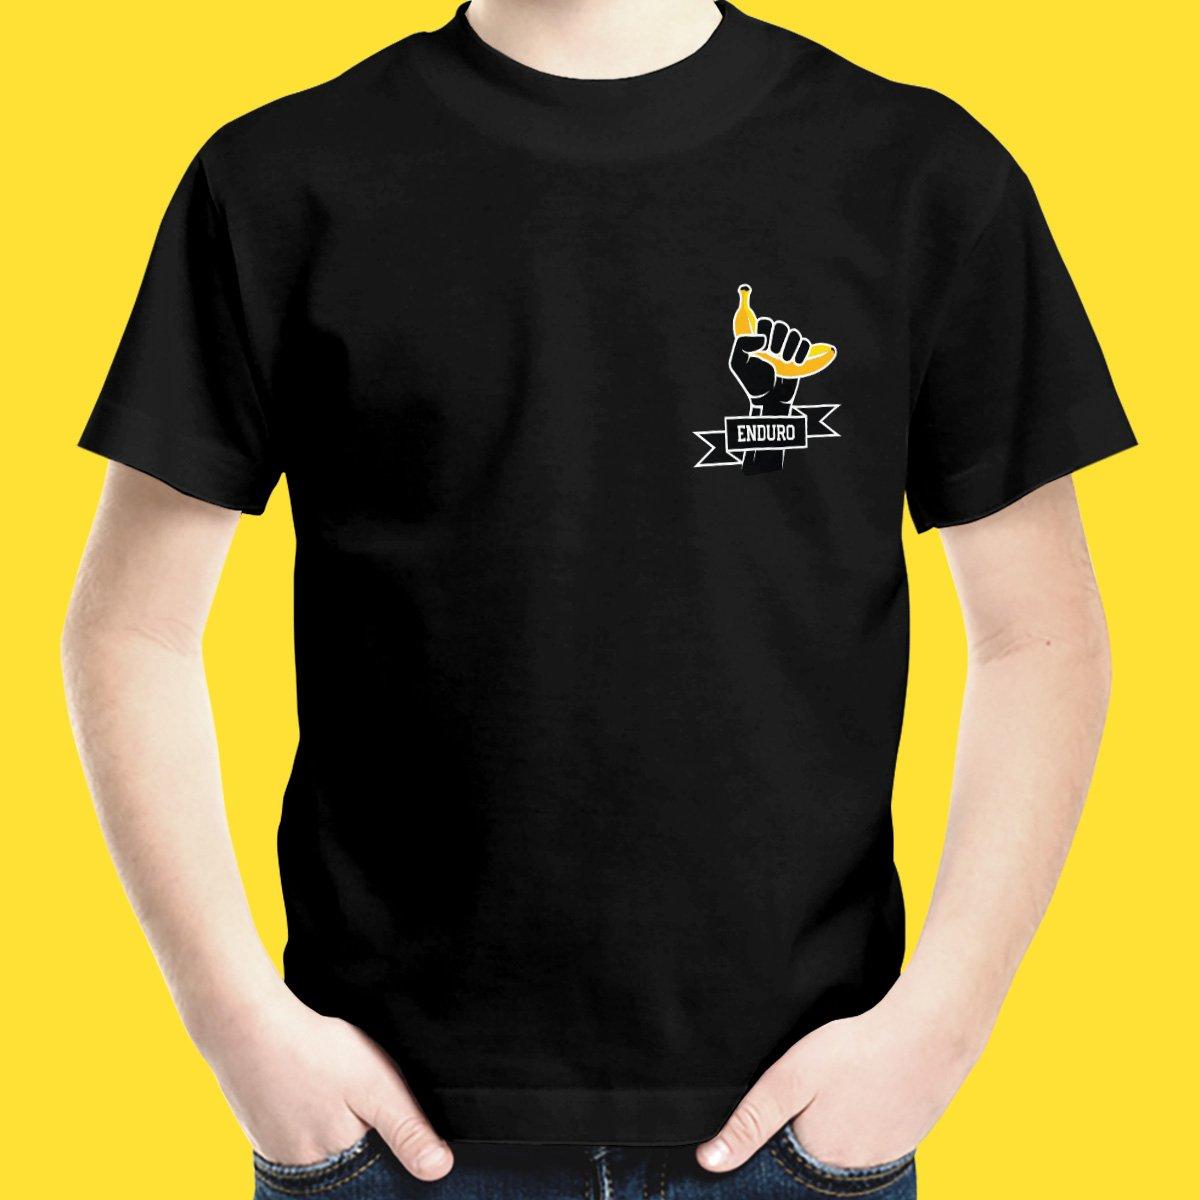 3c9270726 Enduro Banana Short Sleeve Jersey – Kids - Double Drop Apparel